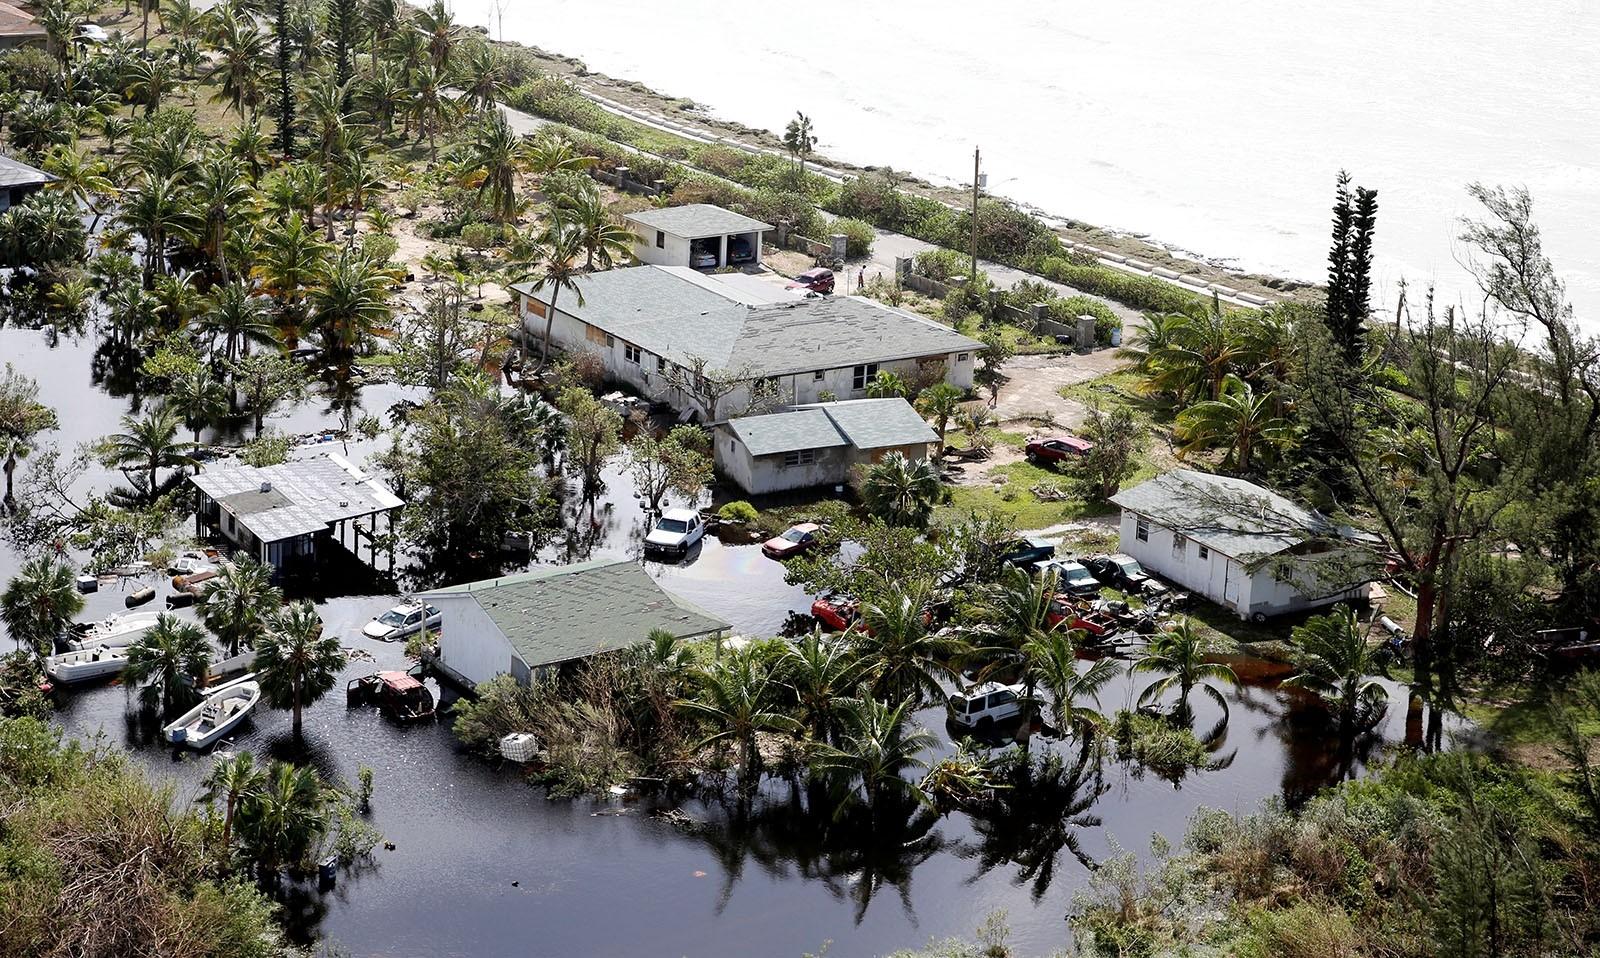 Hurricane Dorian leaves 'generational devastation' on the Bahamas